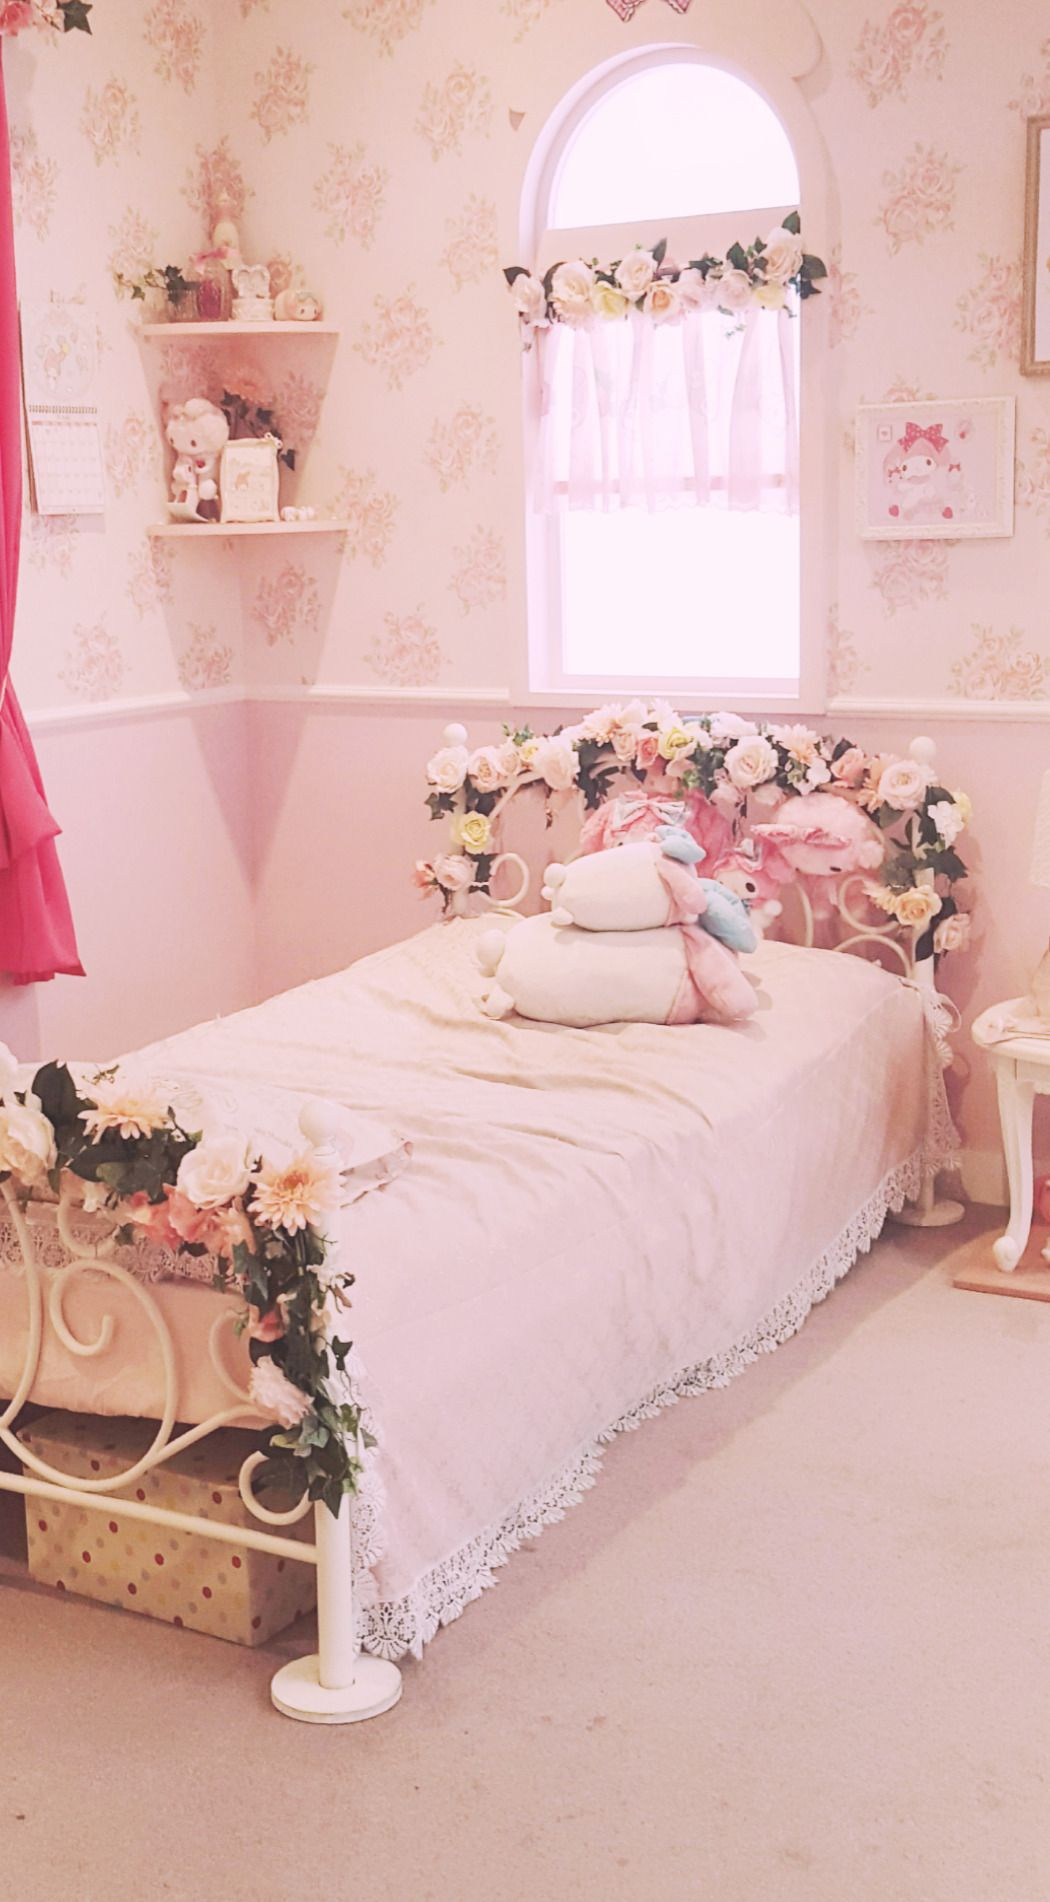 Cute Rooms: Blippo Kawaii Shop ♥ Cute Japanese Gifts, Candy